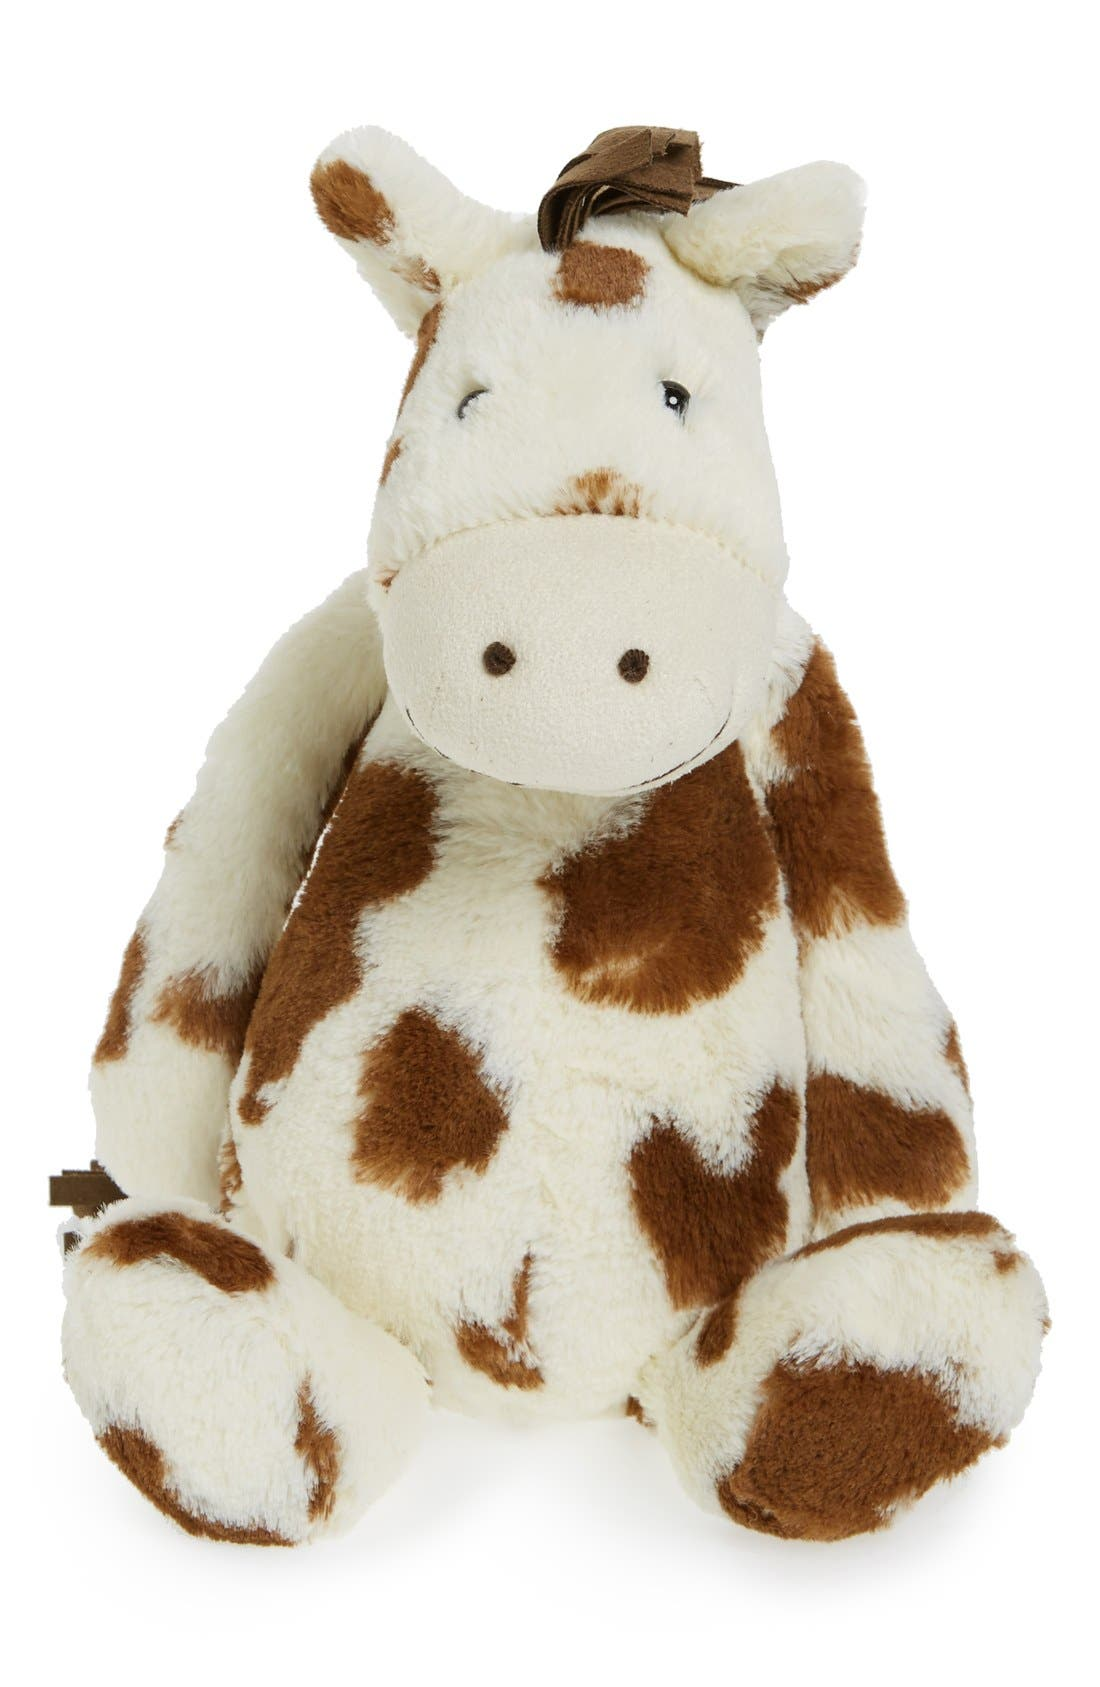 Jellycat 'Medium Bashful Pony' Stuffed Animal